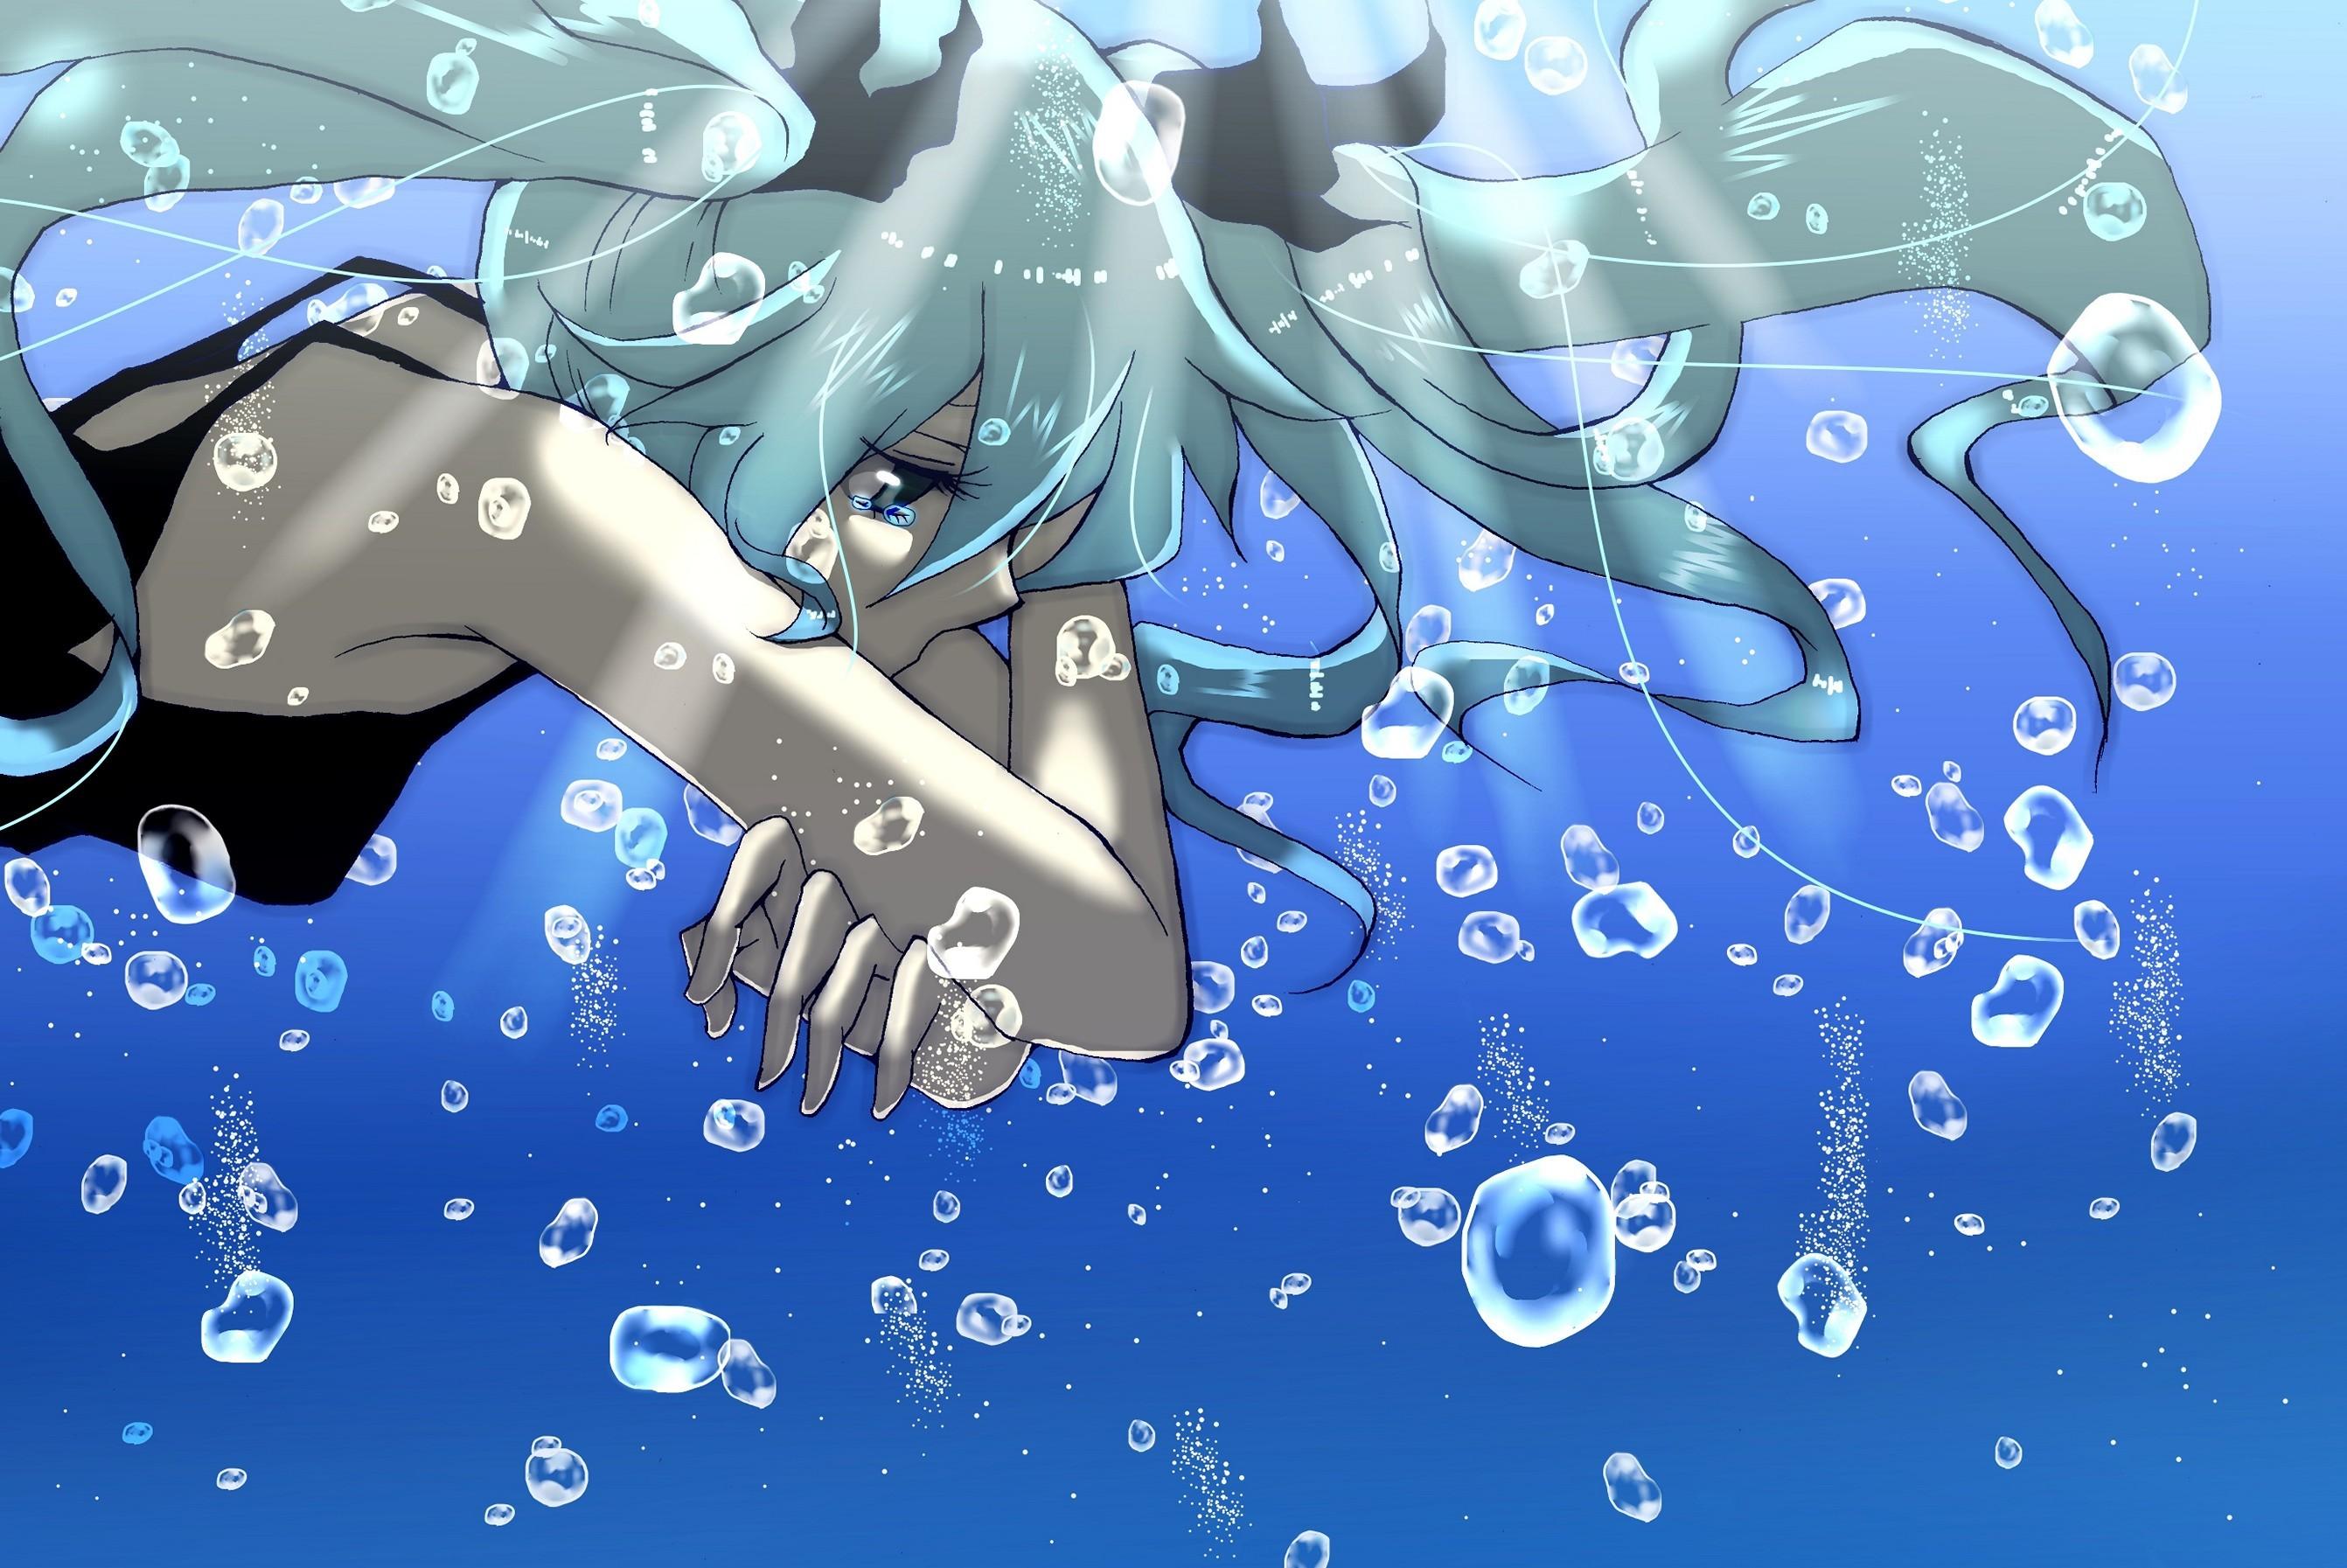 Girl Water Bubbles Sadness Classy Sad Anime Wallpaper